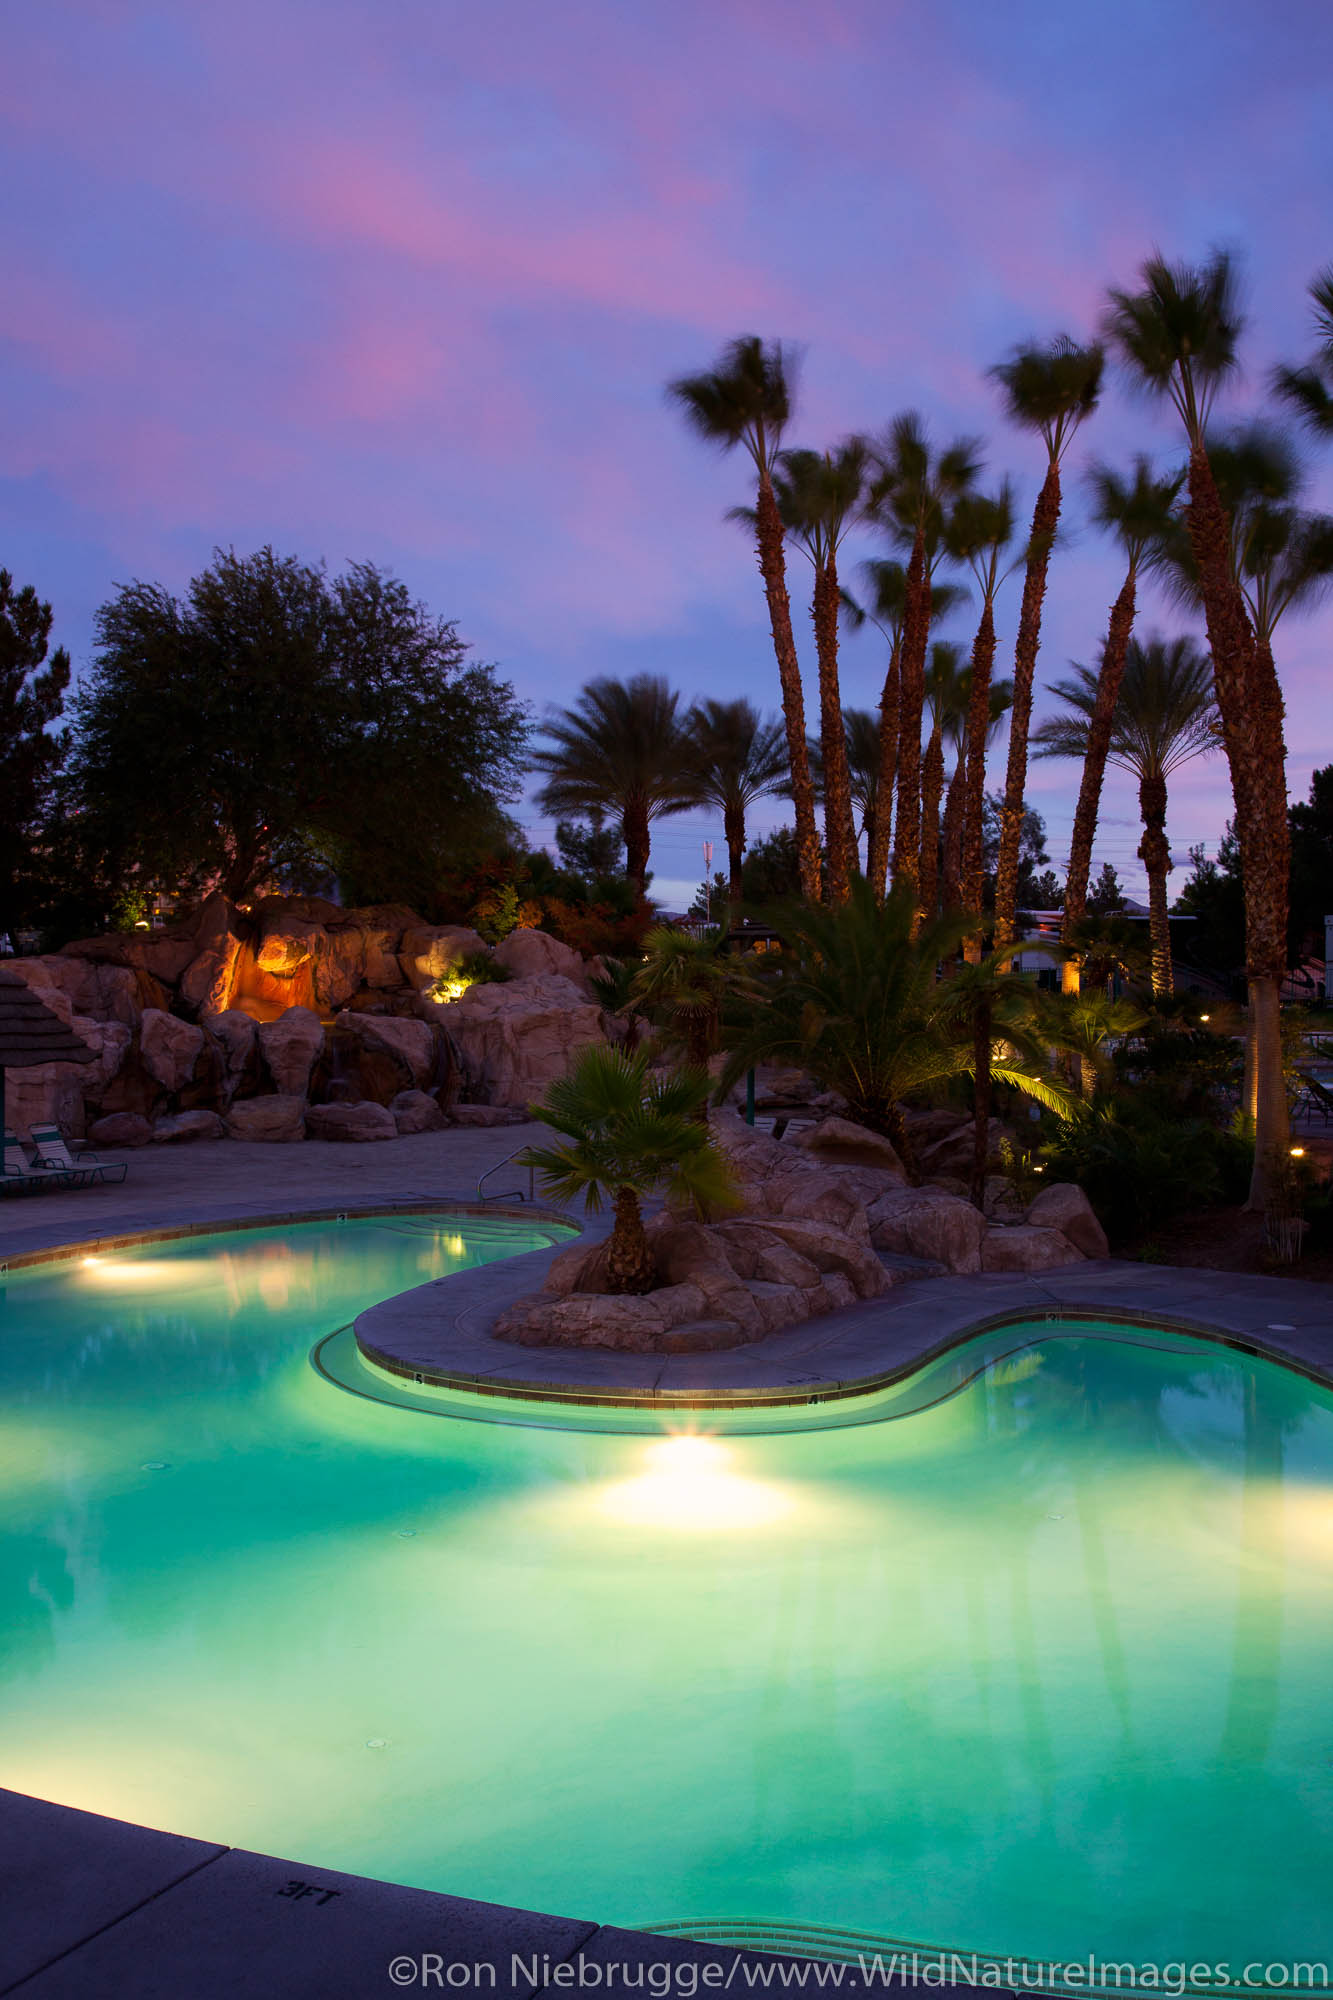 Sunset at Oasis Las Vegas RV Resort, Las Vegas, Nevada